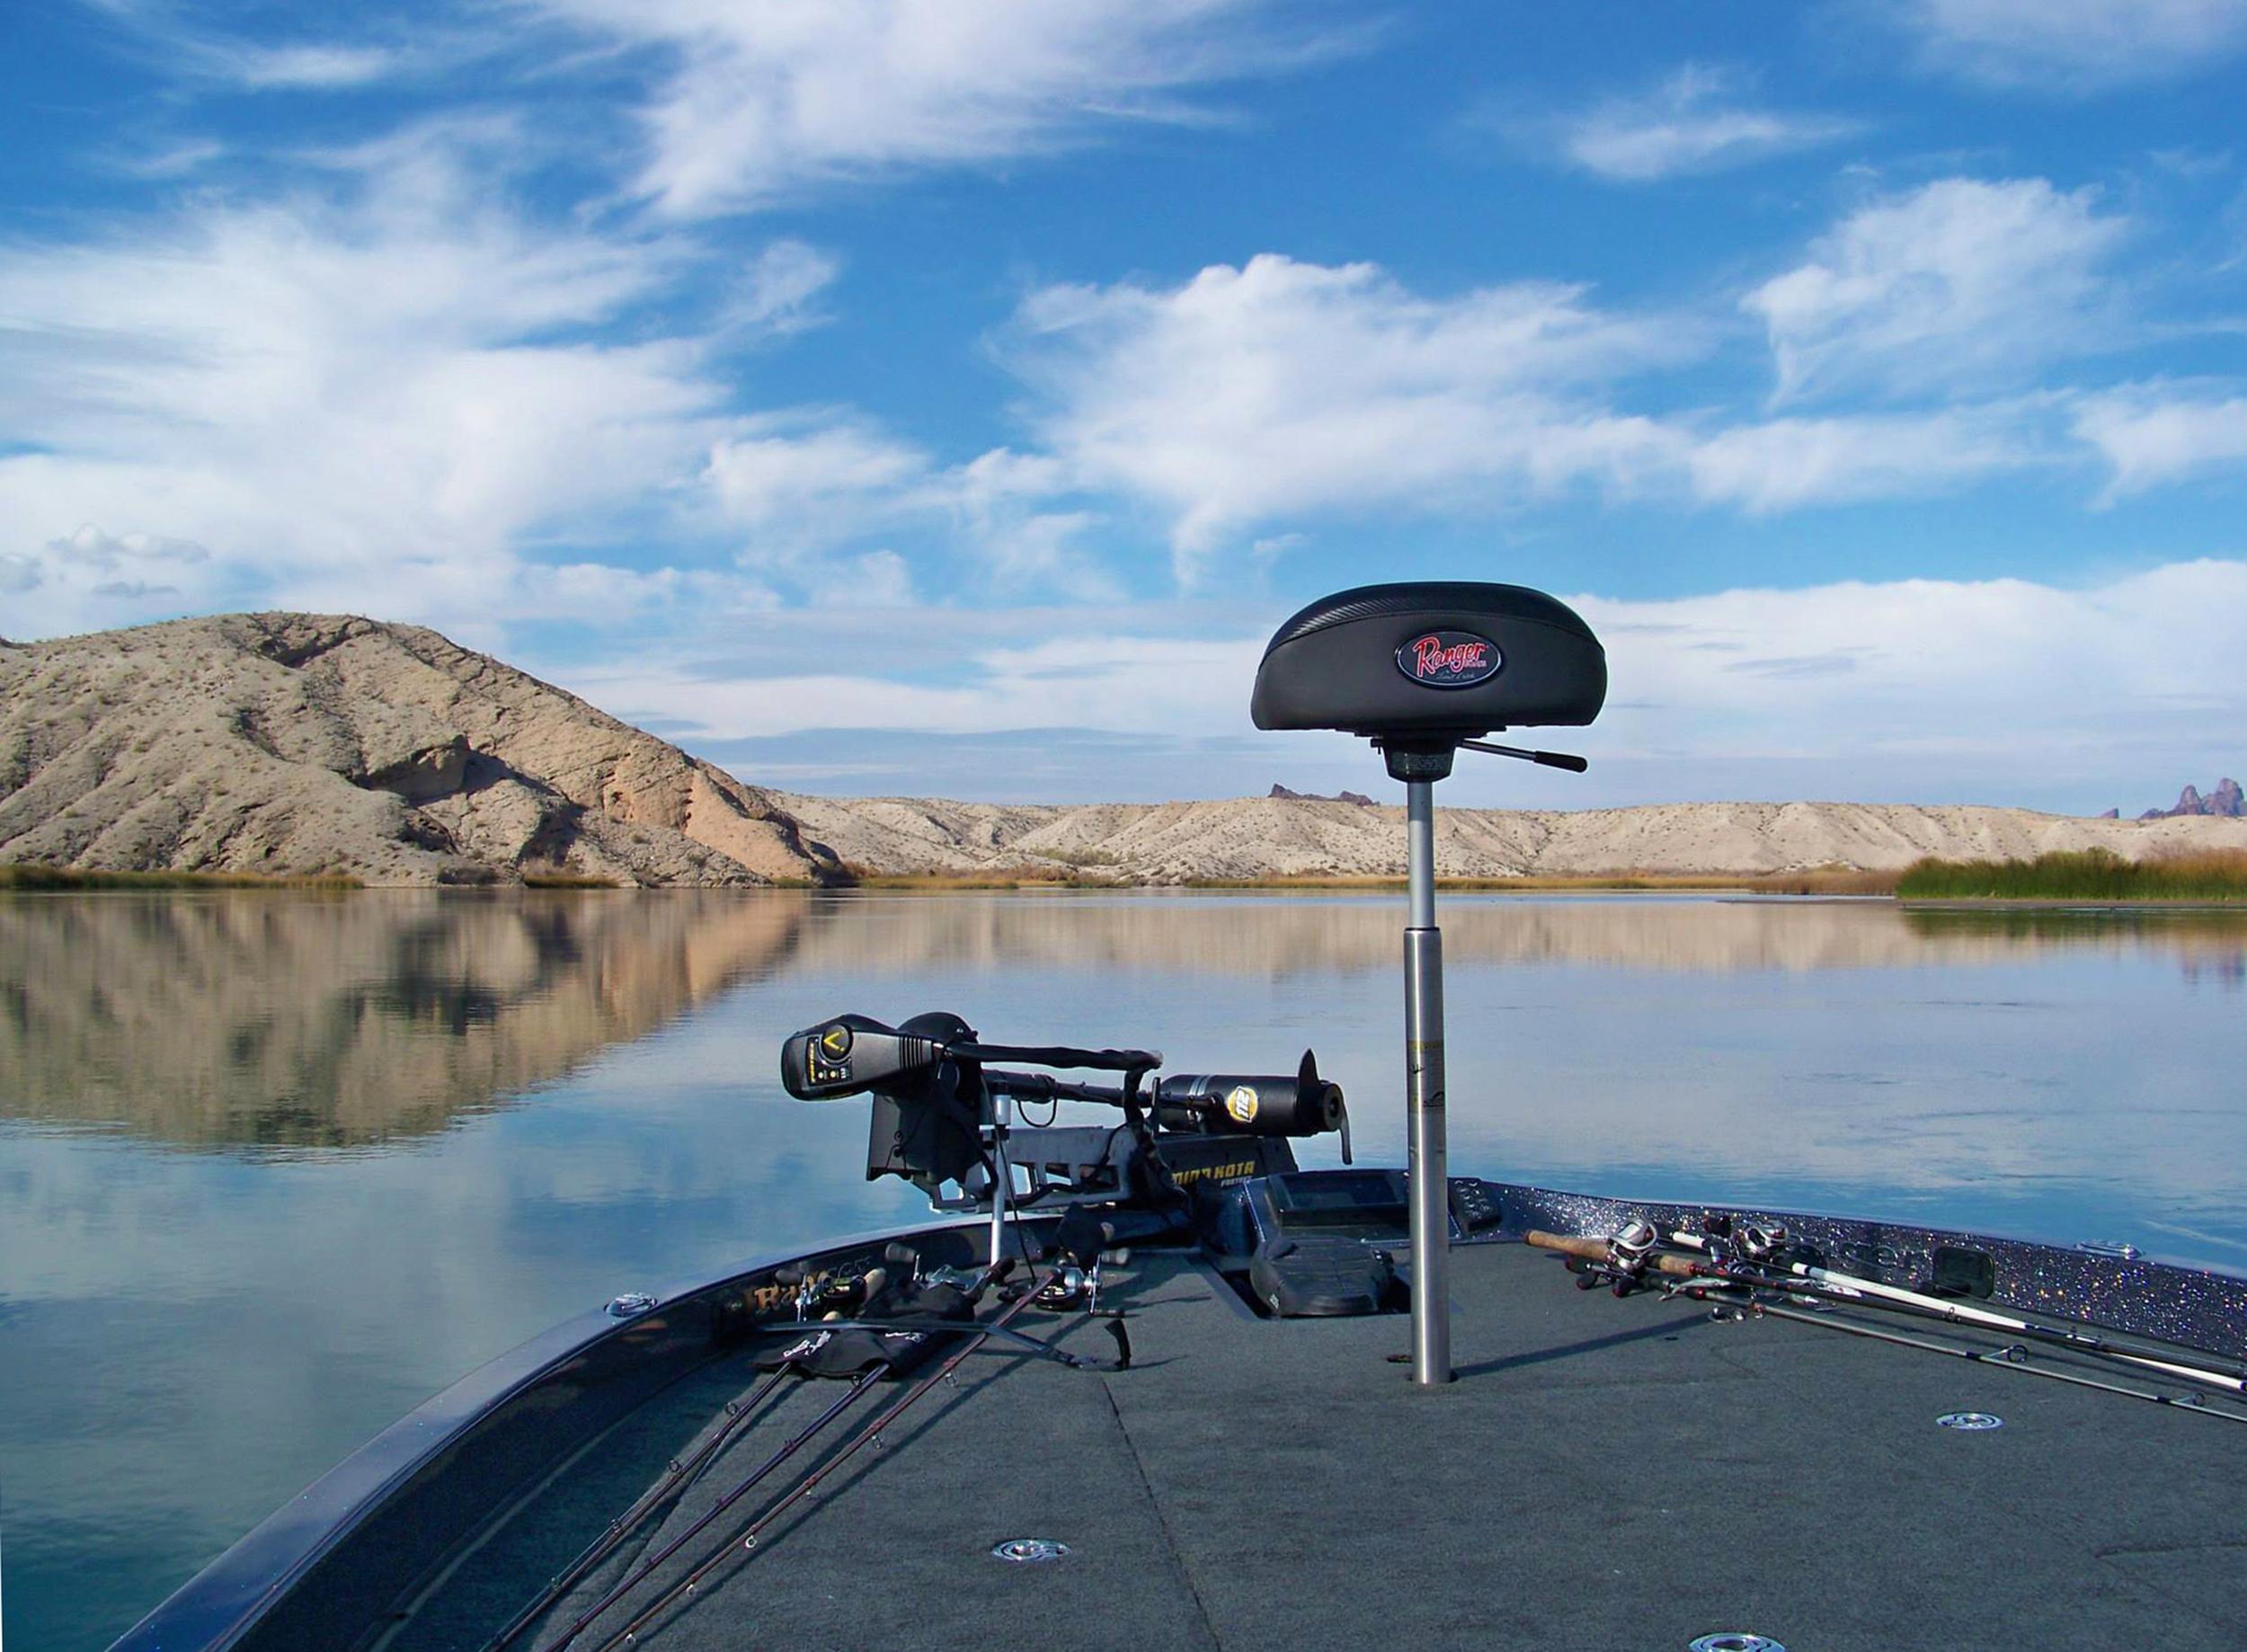 Colorado River at Blankenship Bend